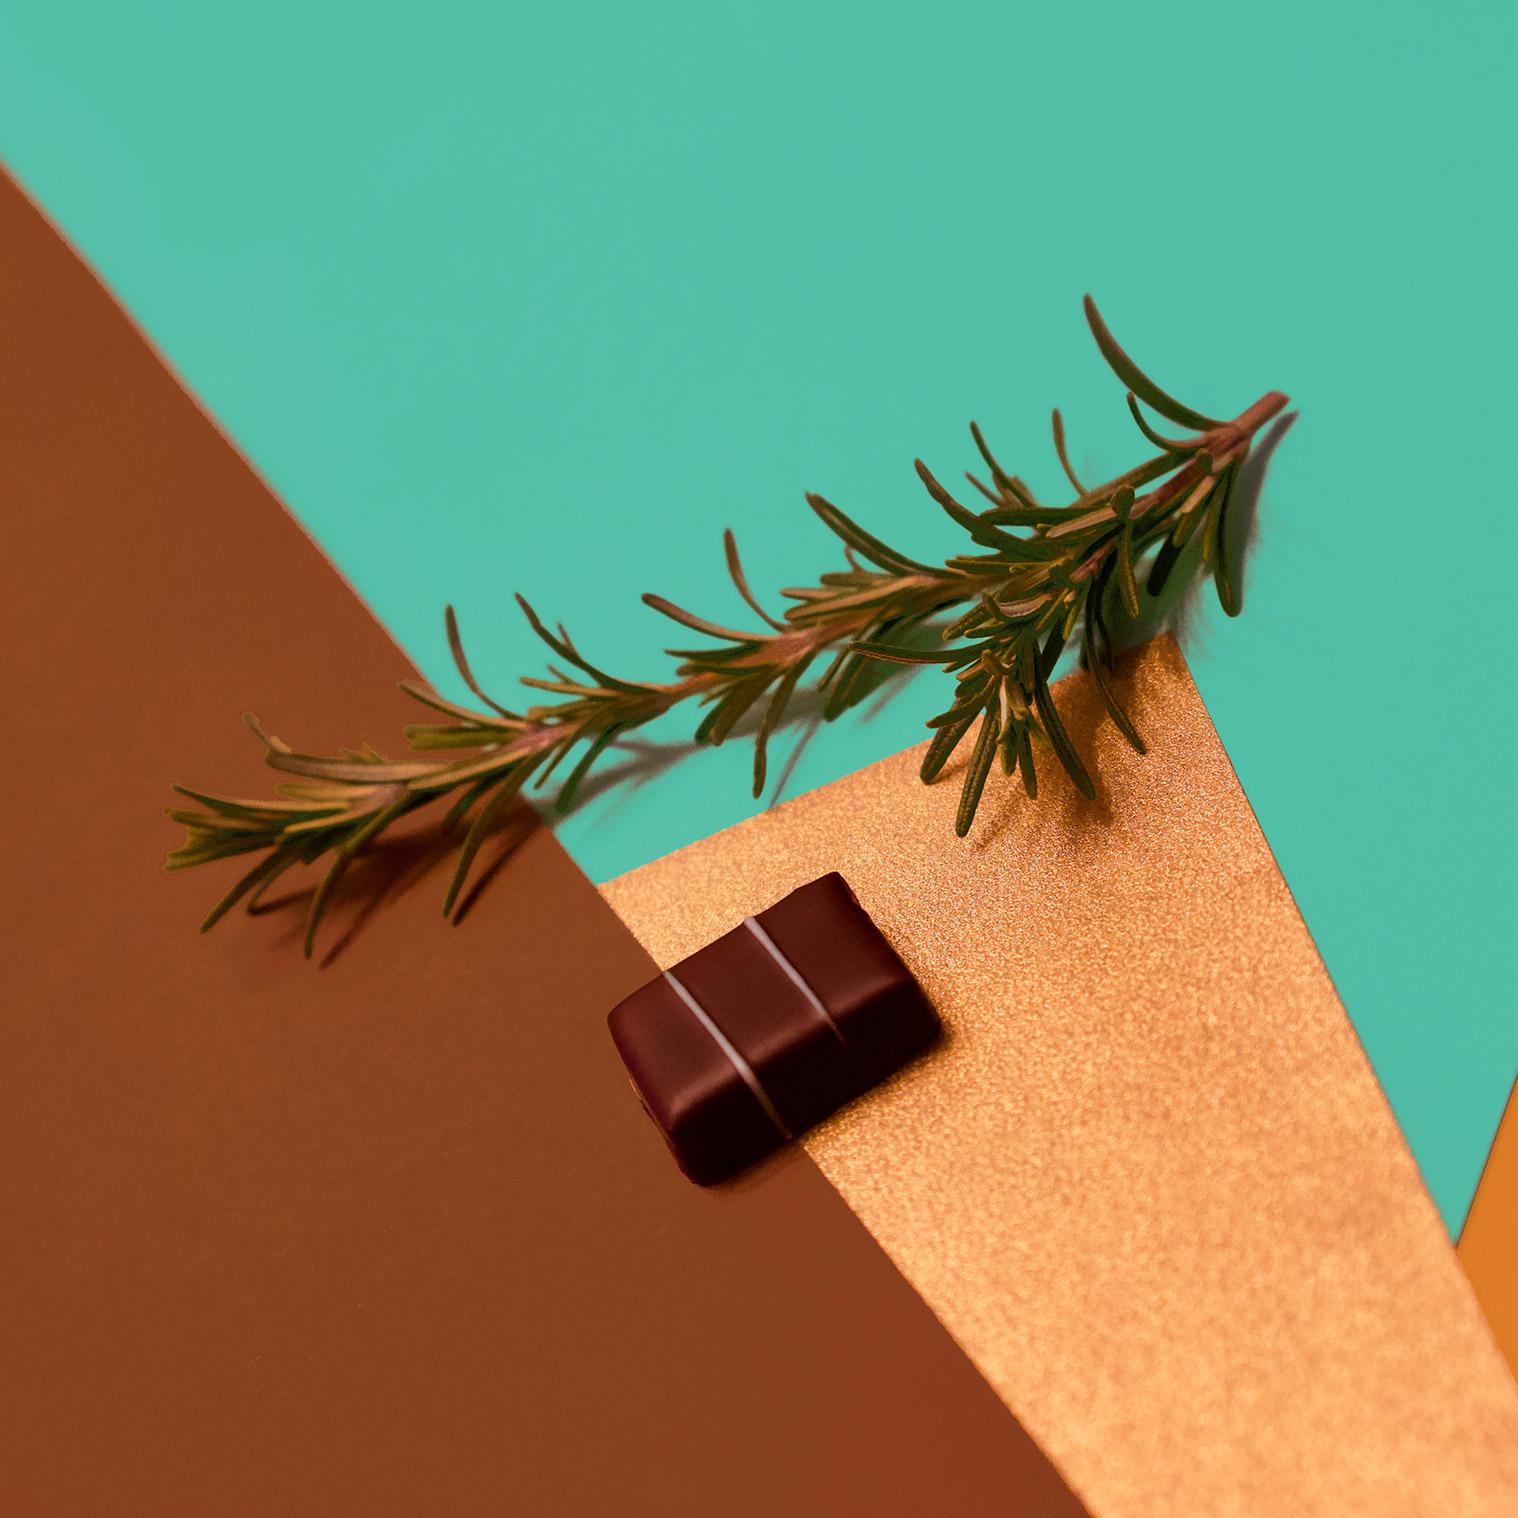 10-ChocolateSquare-11a